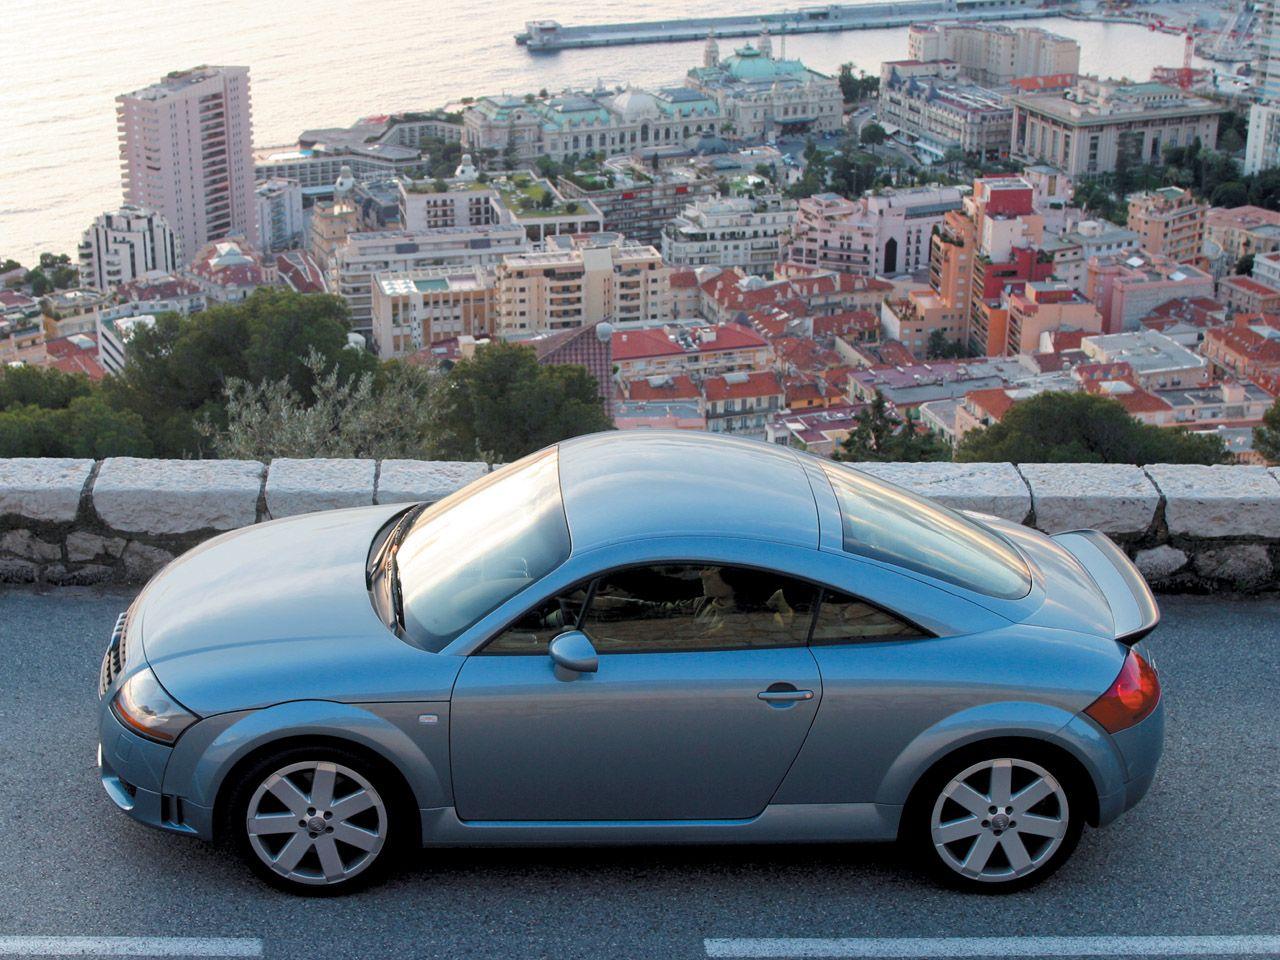 Audi Tt Coupe Side City View 1280x960 Wallpaper Voiture